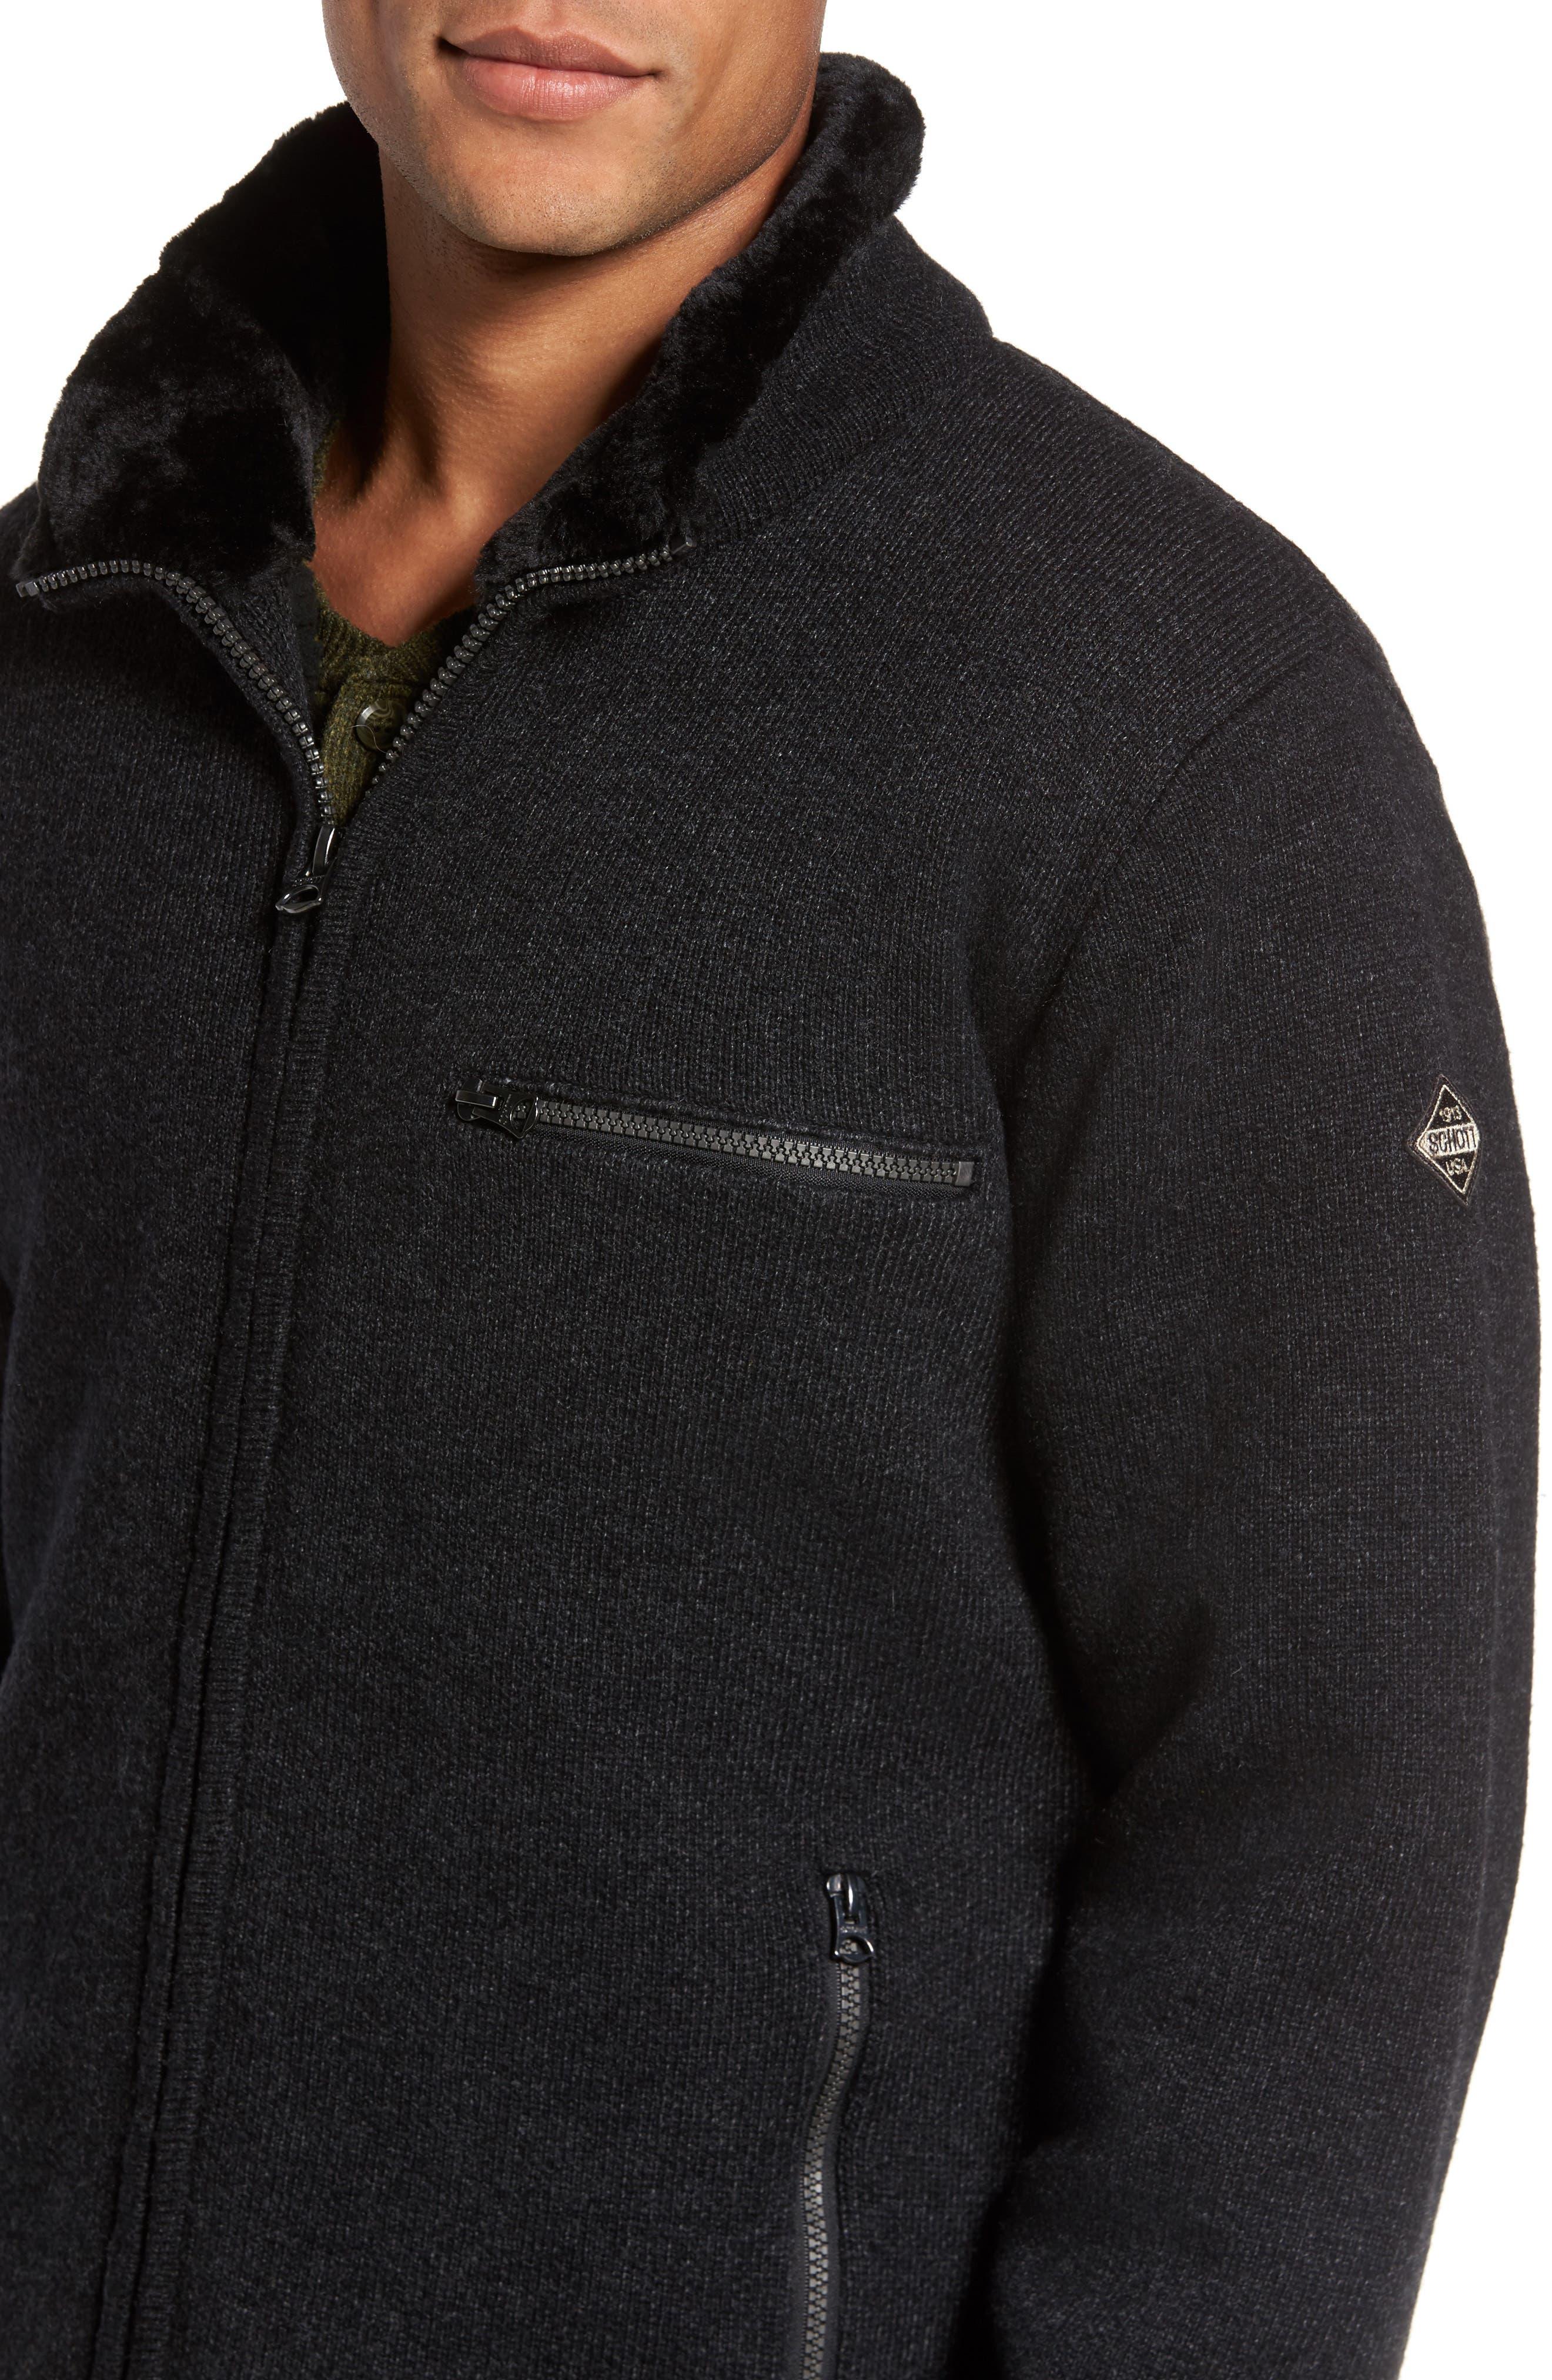 Caf Faux Fur Lined Sweater Jacket,                             Alternate thumbnail 4, color,                             BLACK